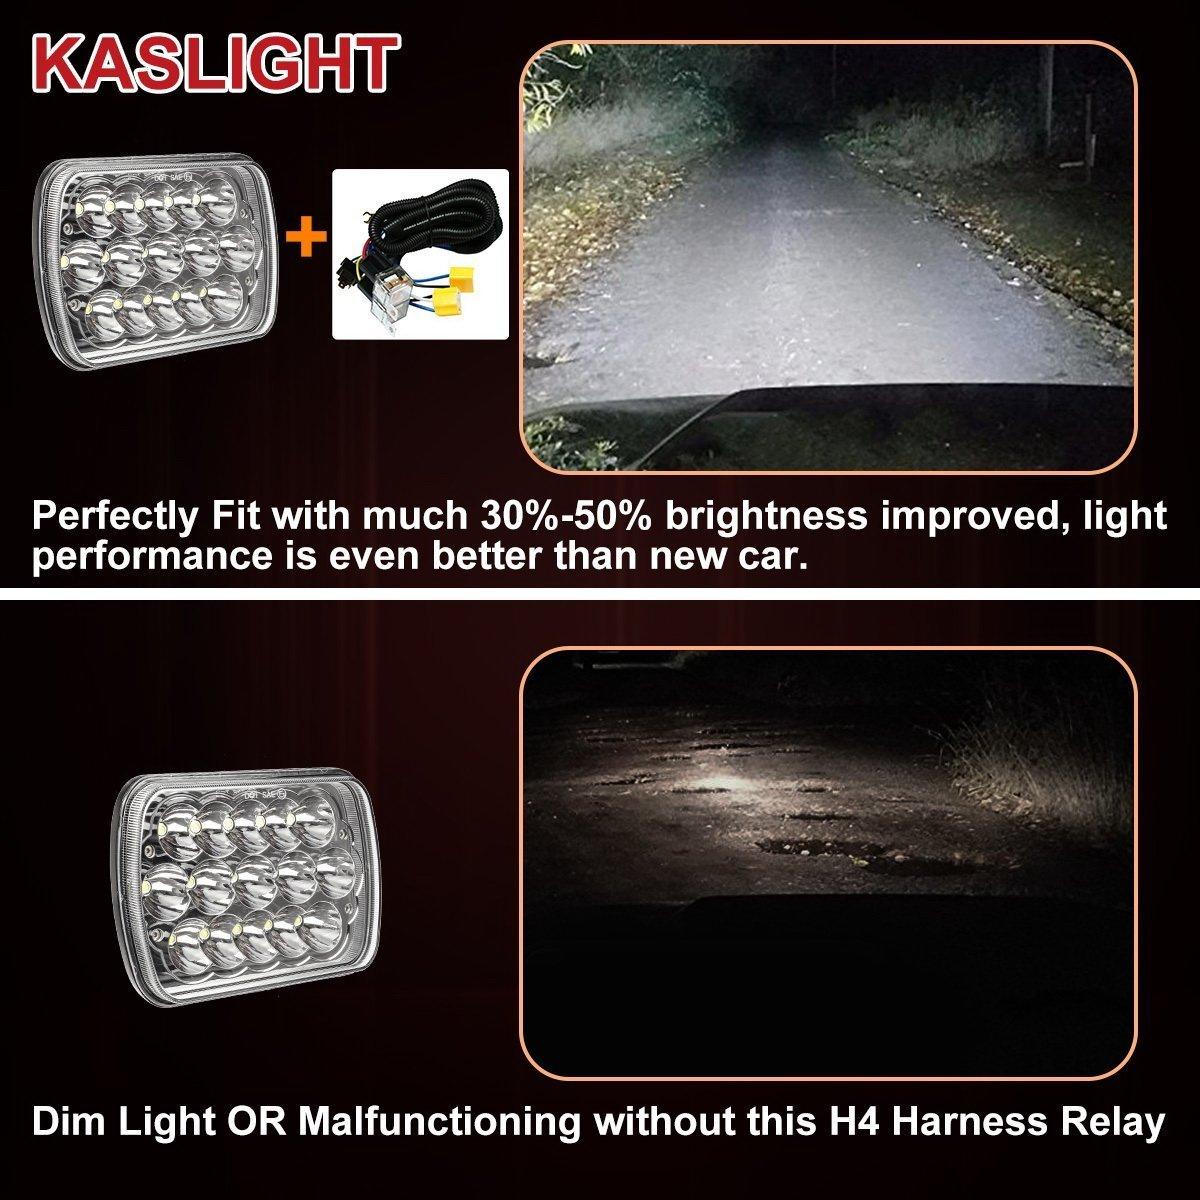 1set 2 Headlight Harness H4 Relay 91 S10 Wiring Diagram Grounding H6054 Toyota Pickup Headlights Kit For